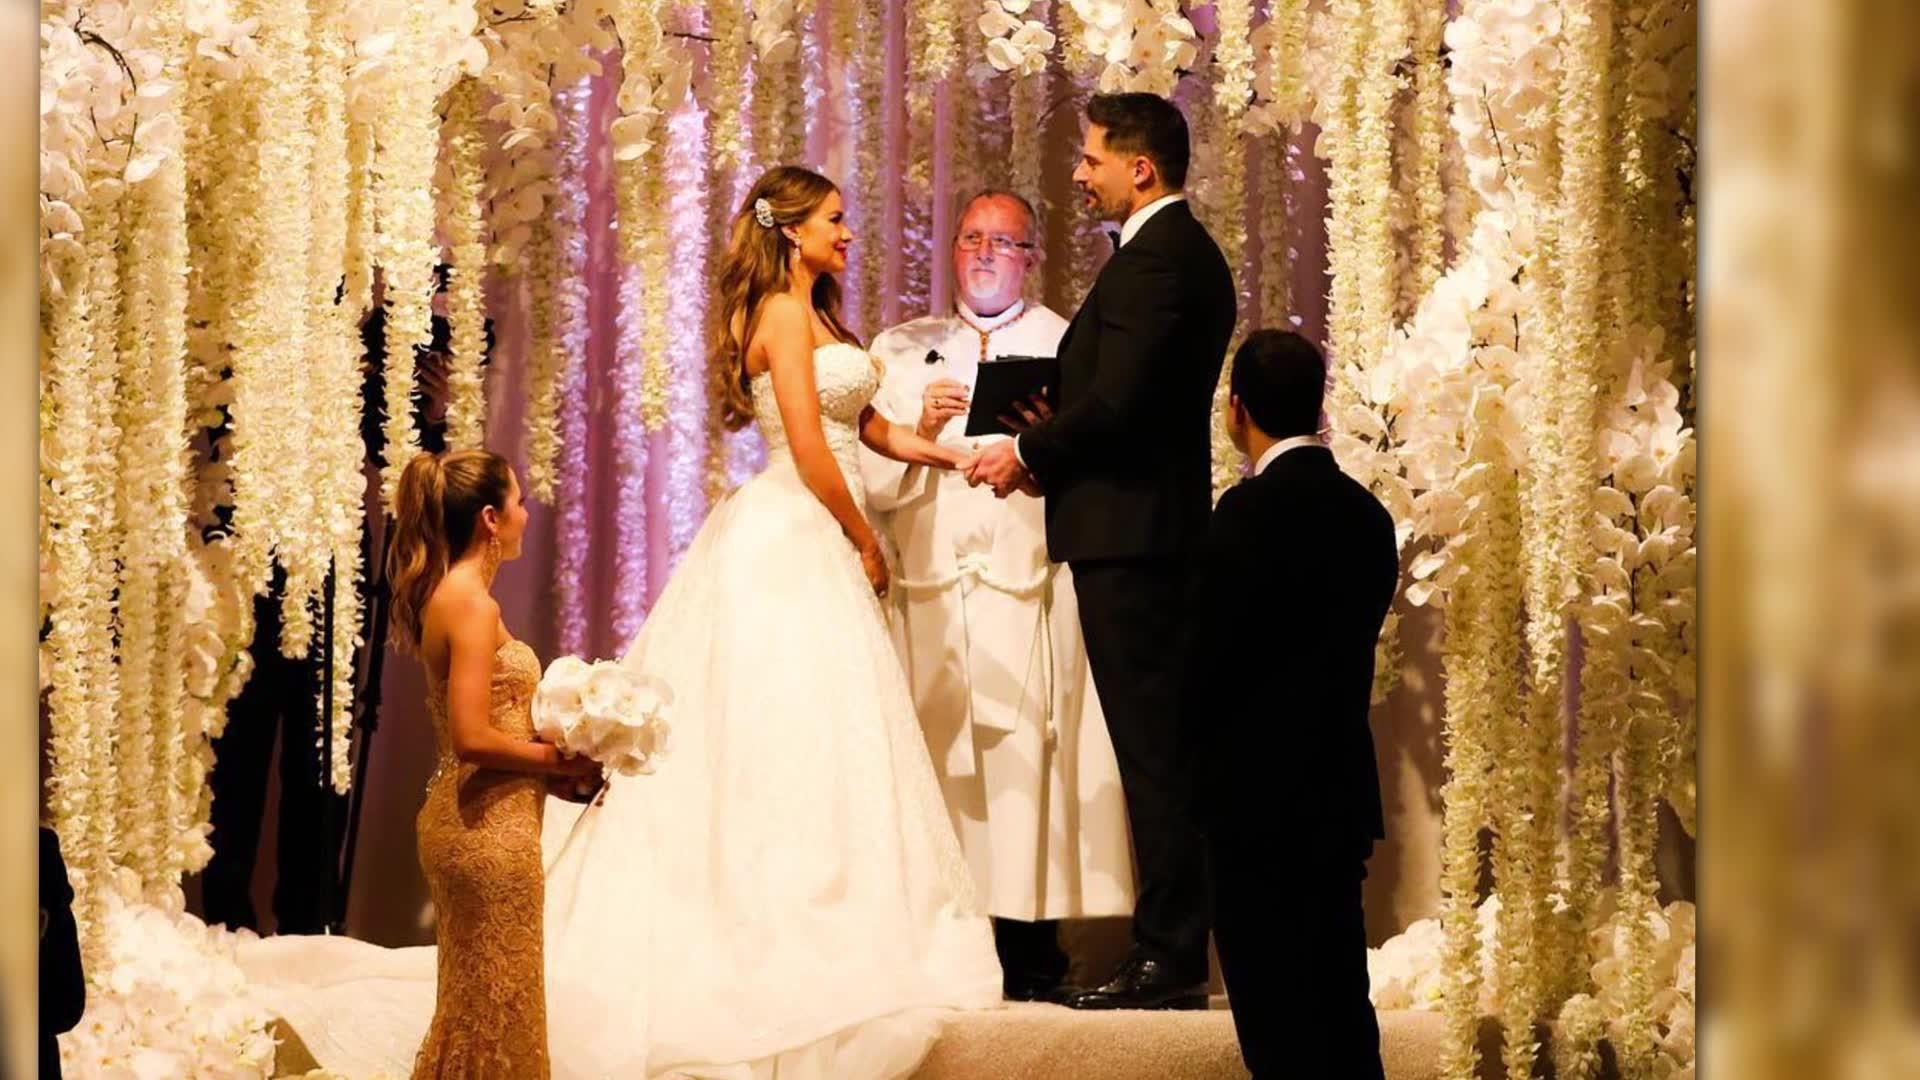 Find Out What Went Down at Sofia Vergara and Joe Manganiello's Wedding